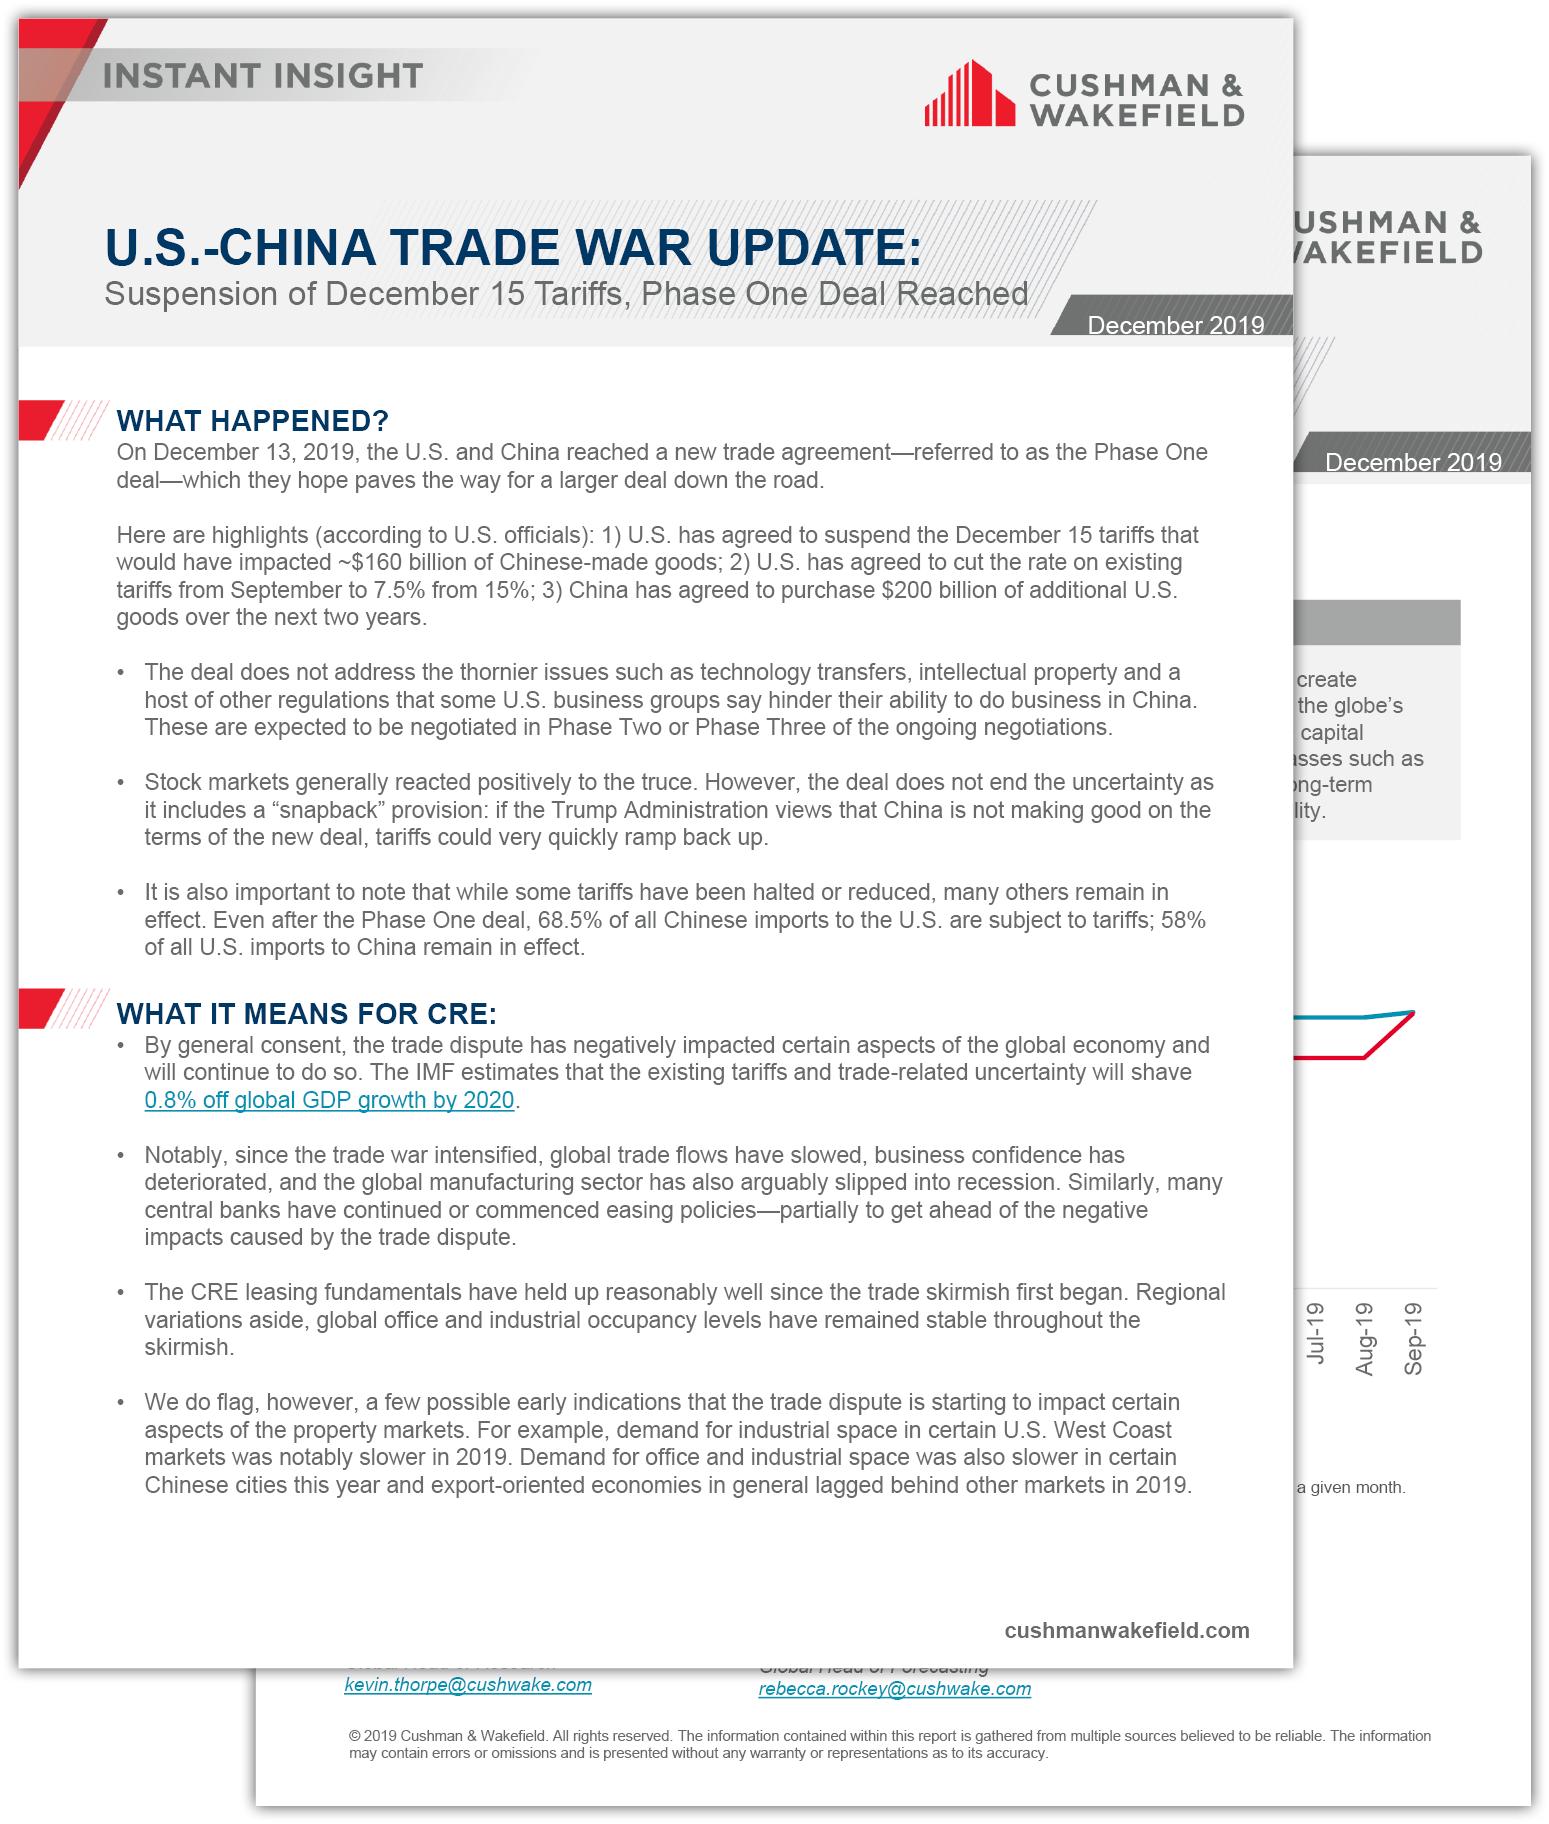 US China Trade War Update Report Thumbnail